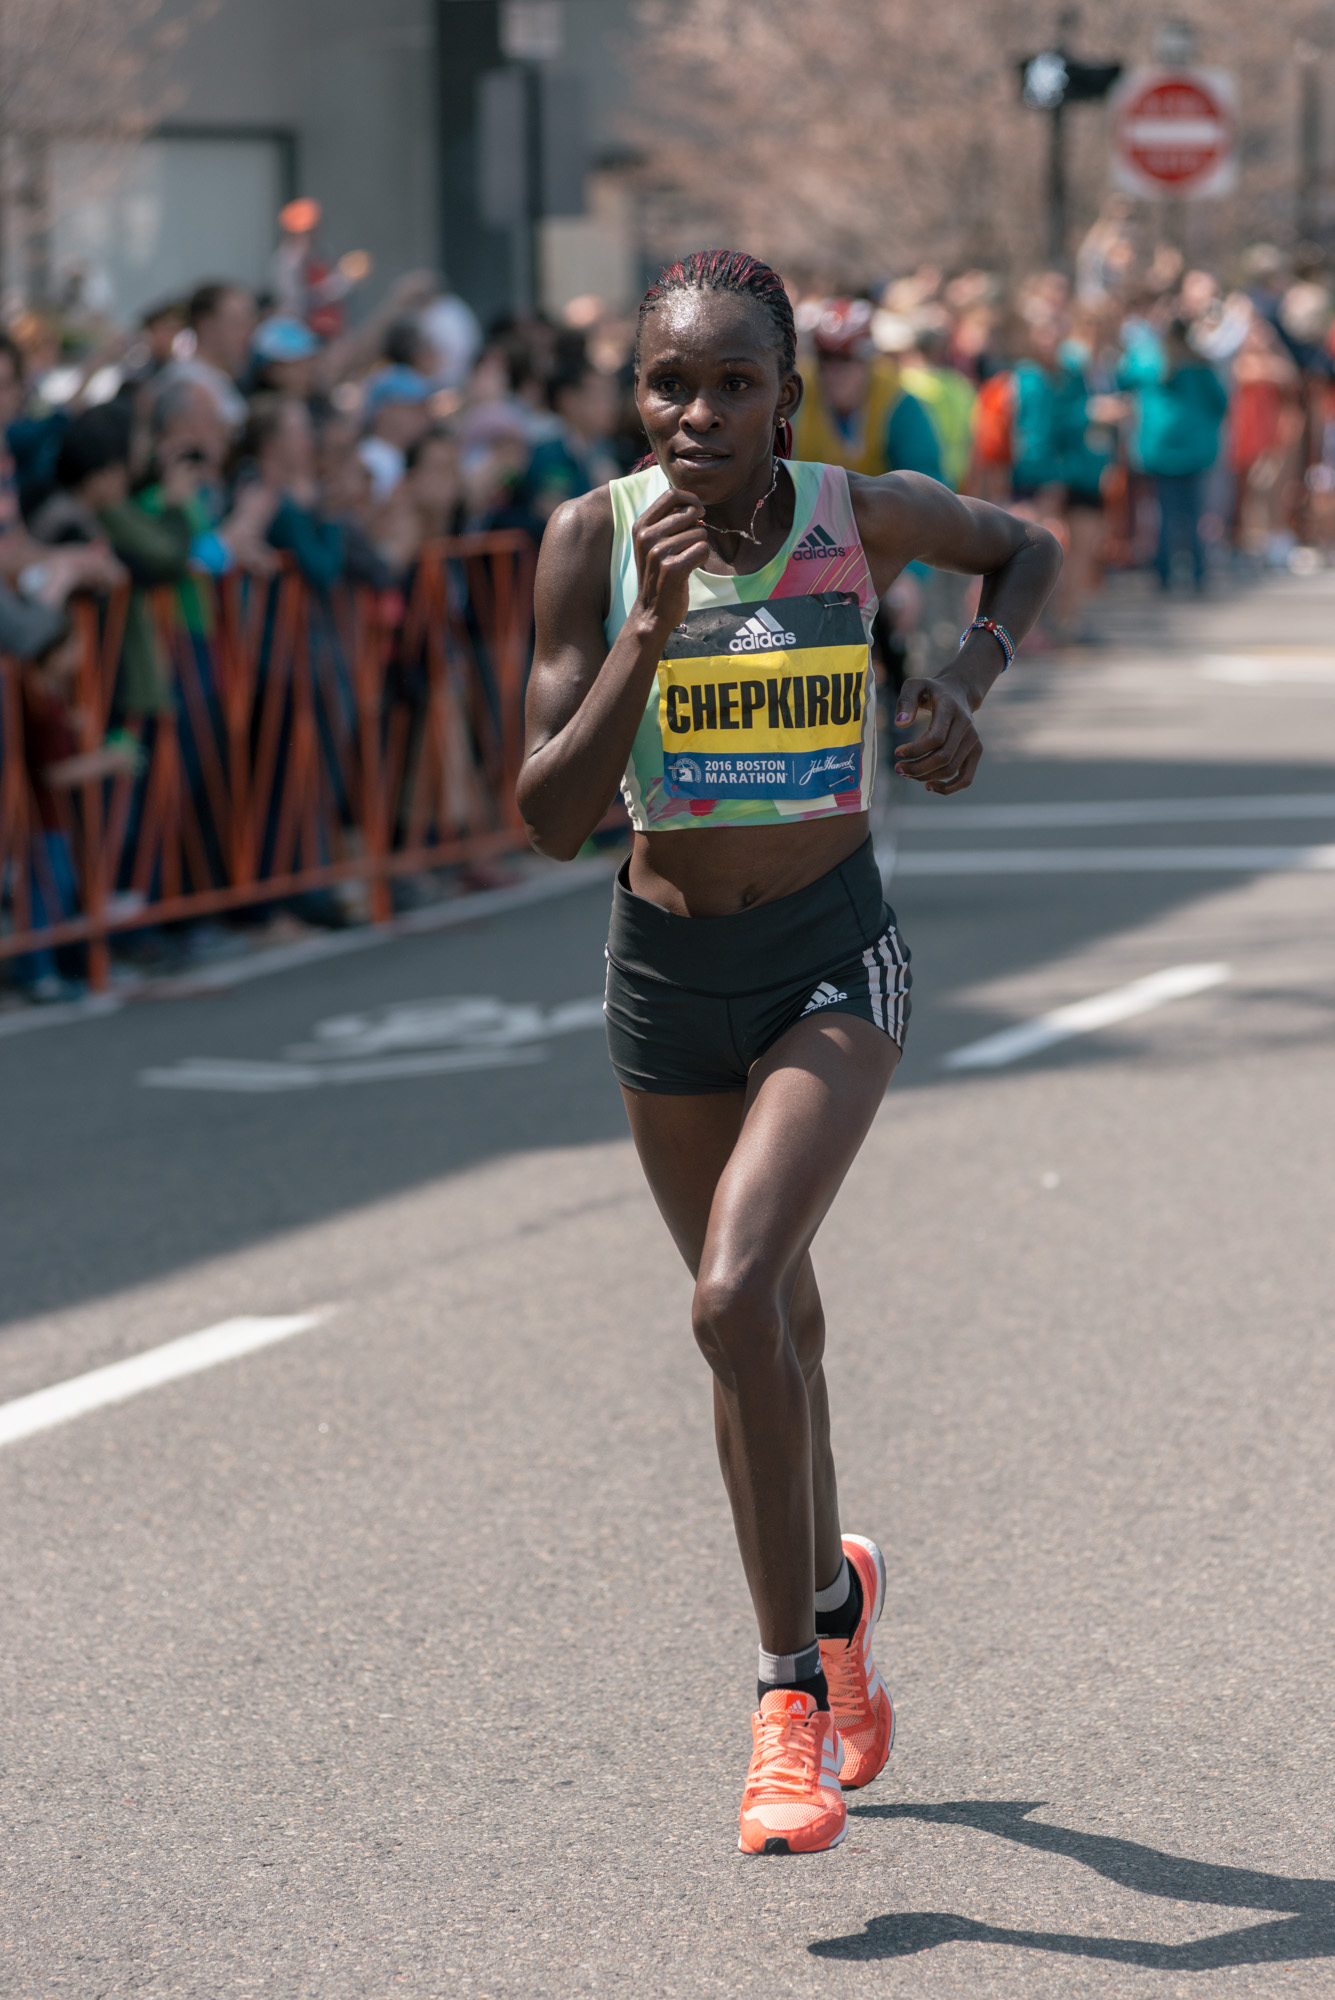 Joyce Chepkirui -3rd place